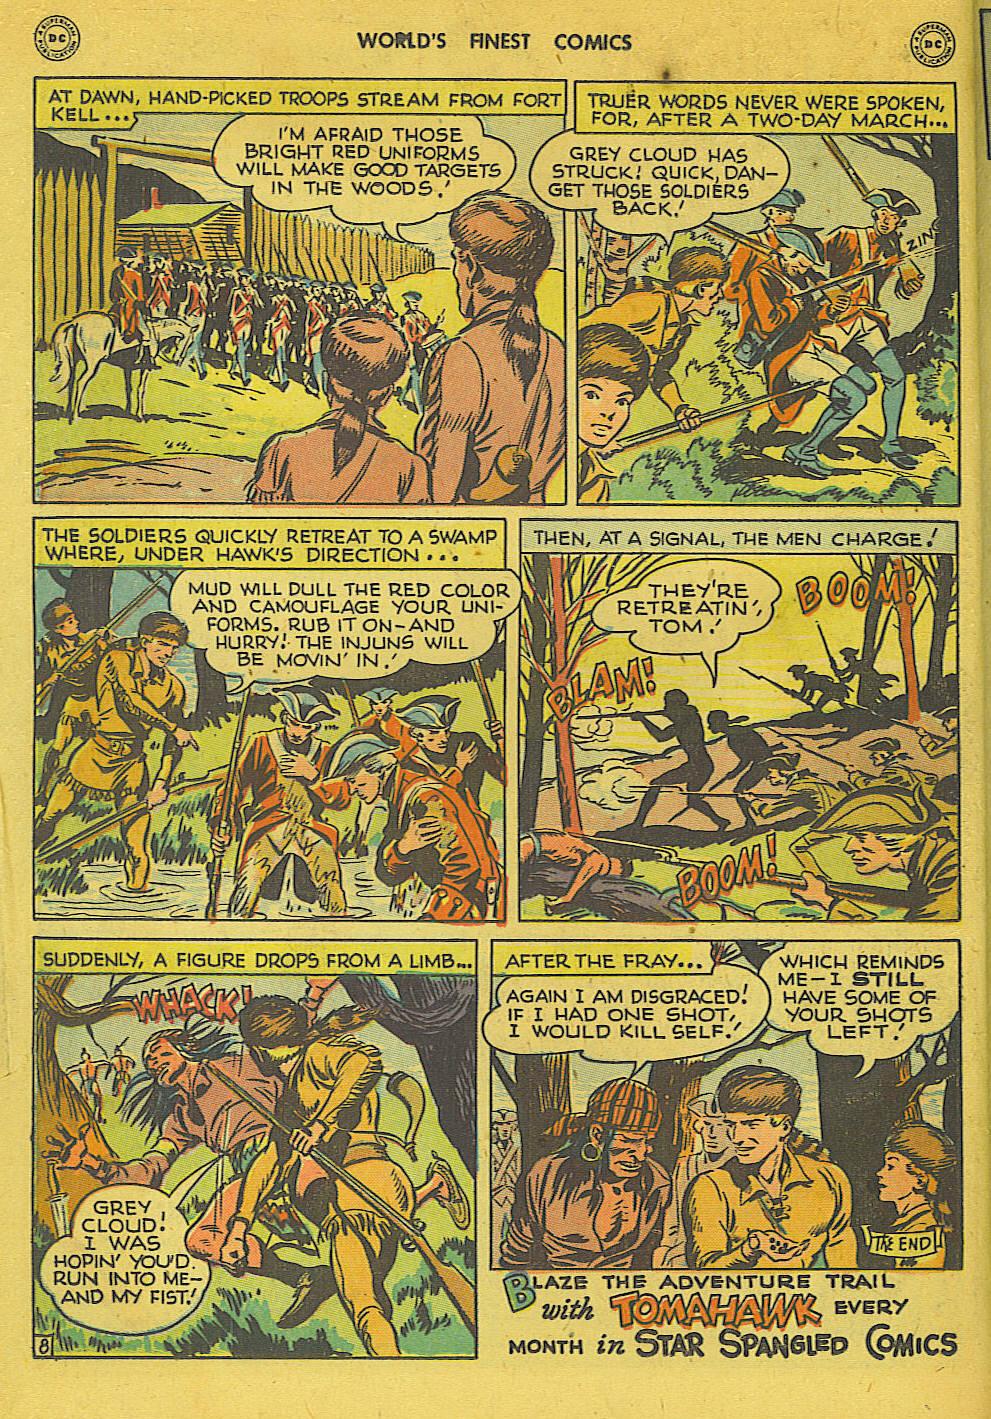 Read online World's Finest Comics comic -  Issue #34 - 24